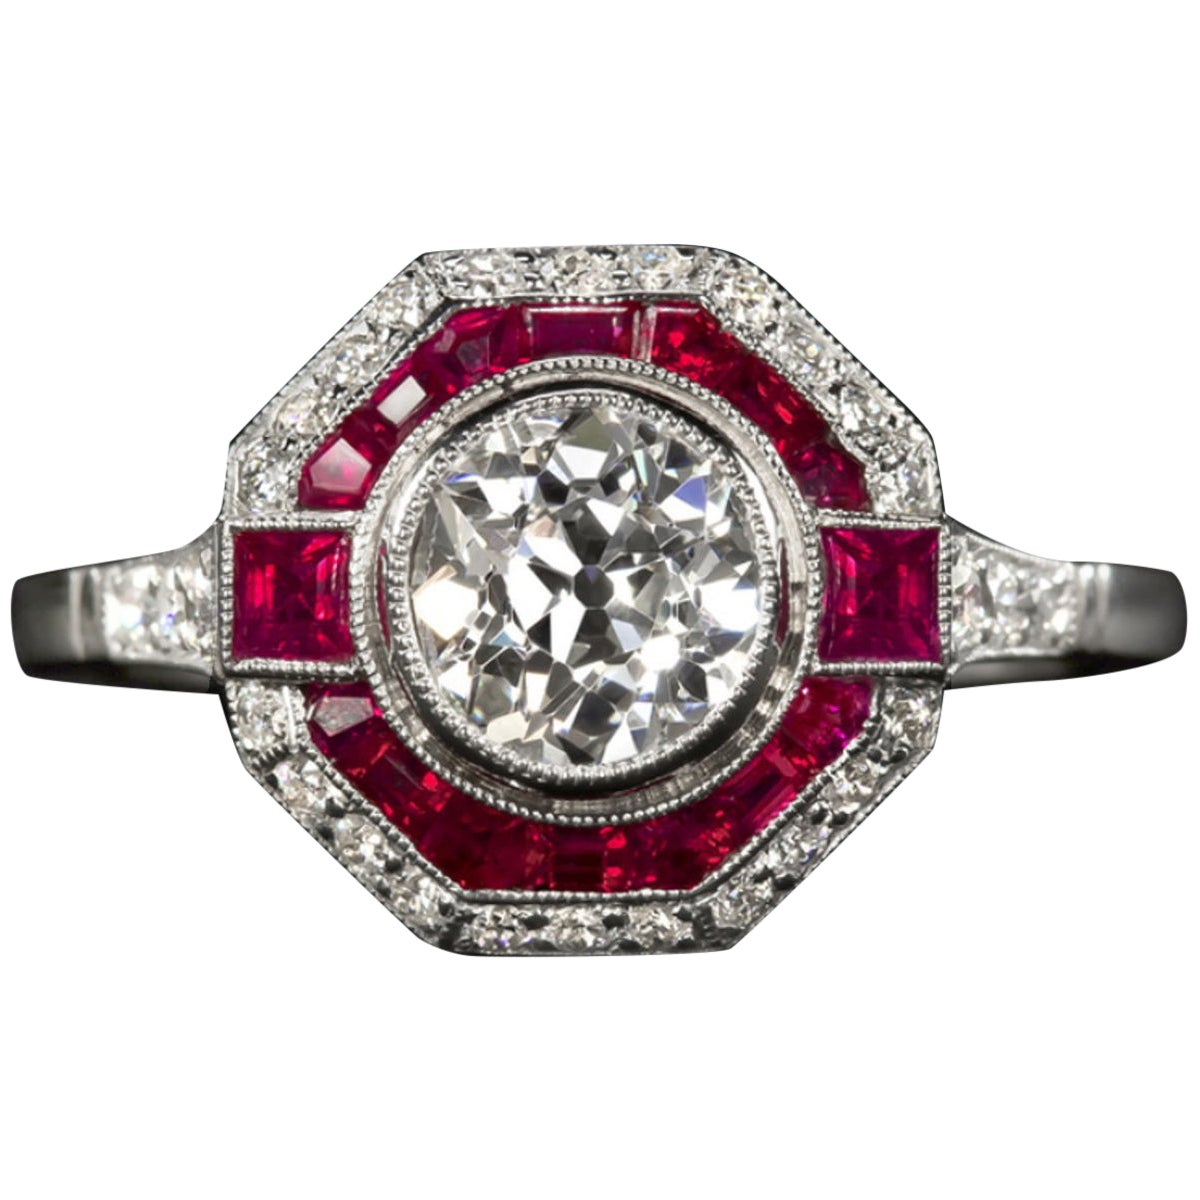 Old Cut Diamond Engagement Ring Ruby Platinum